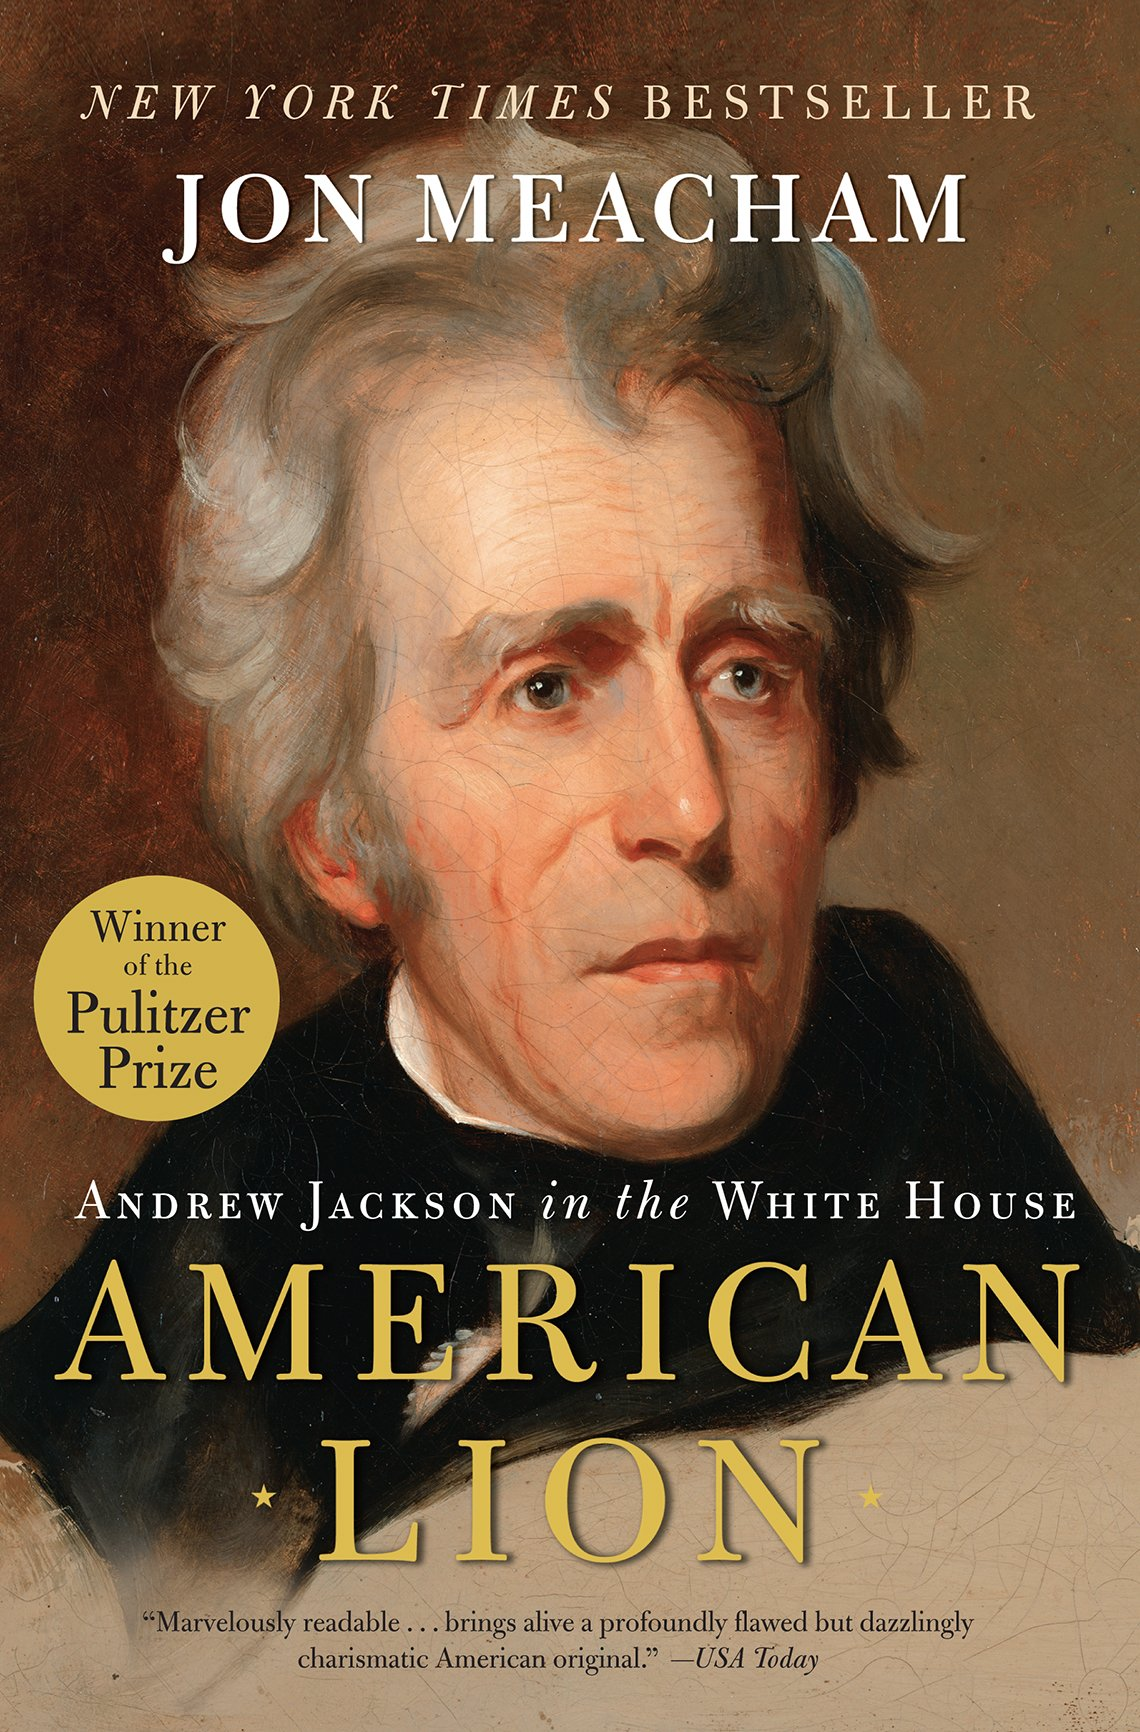 American Lion, Andrew Jackson in the White House, por Ron Meacham.